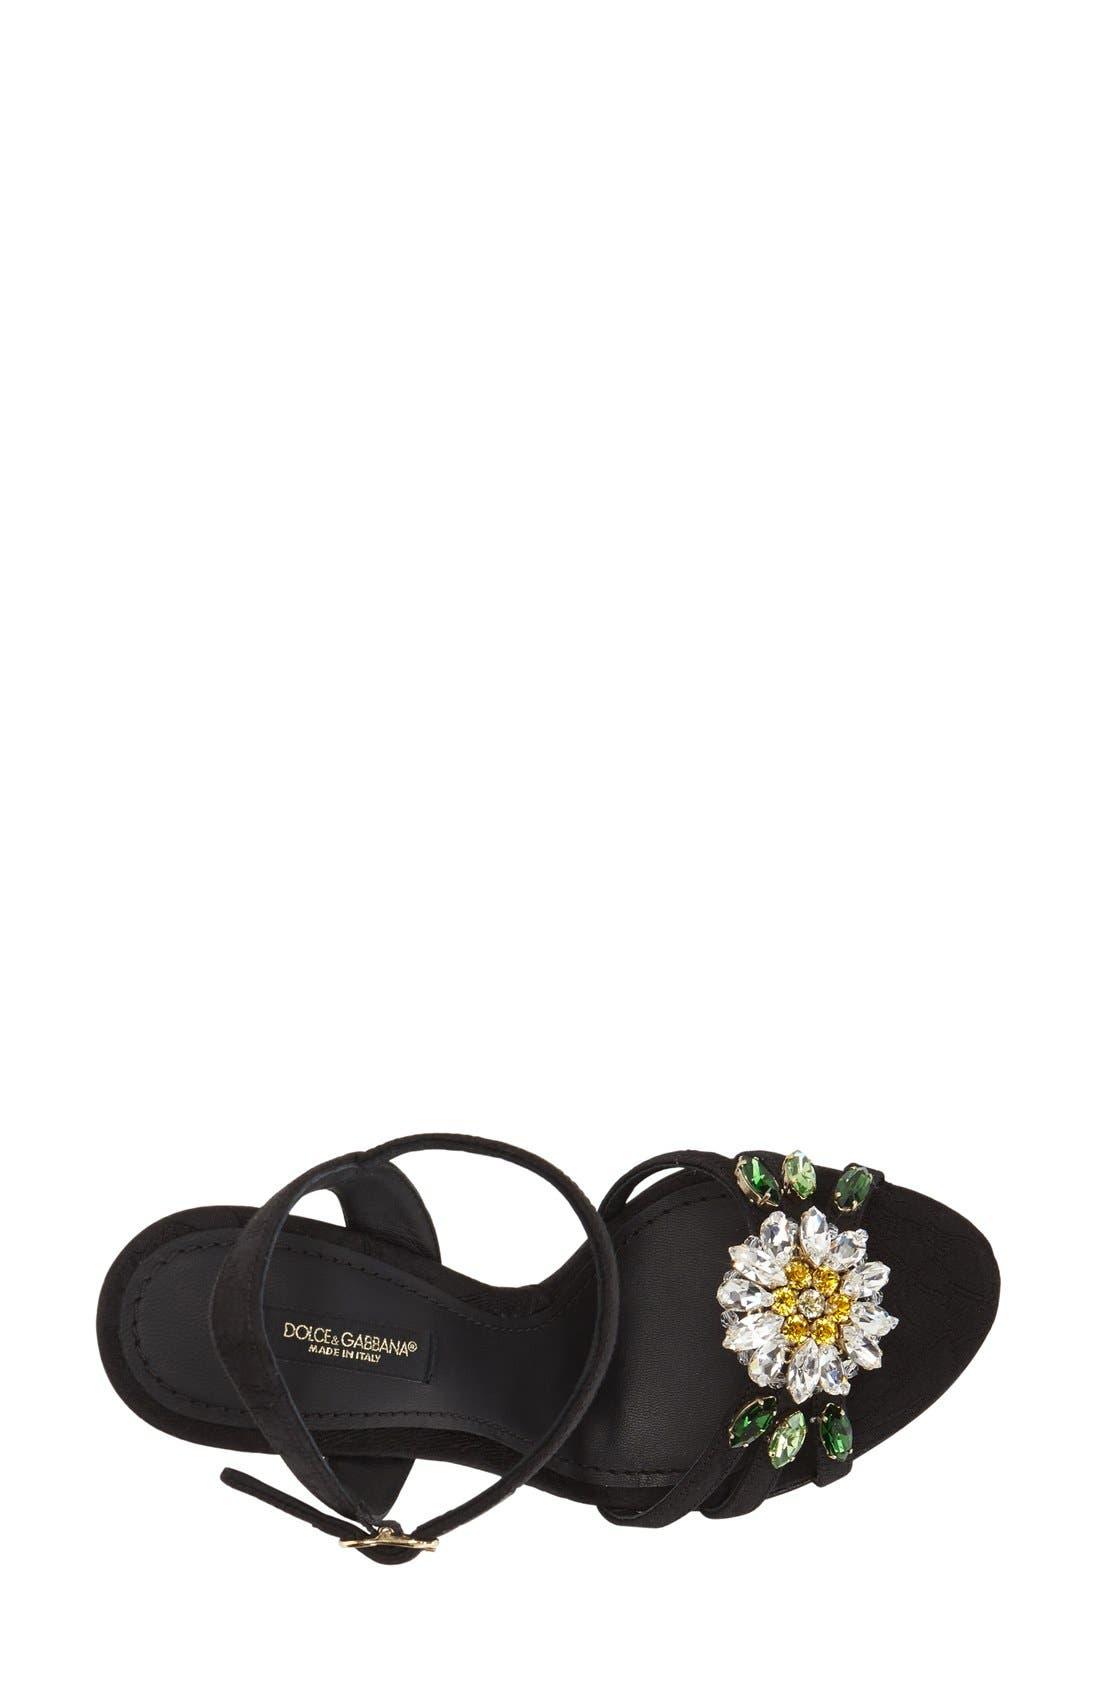 DOLCE&GABBANA, Jeweled Strappy Sandal, Alternate thumbnail 4, color, 001